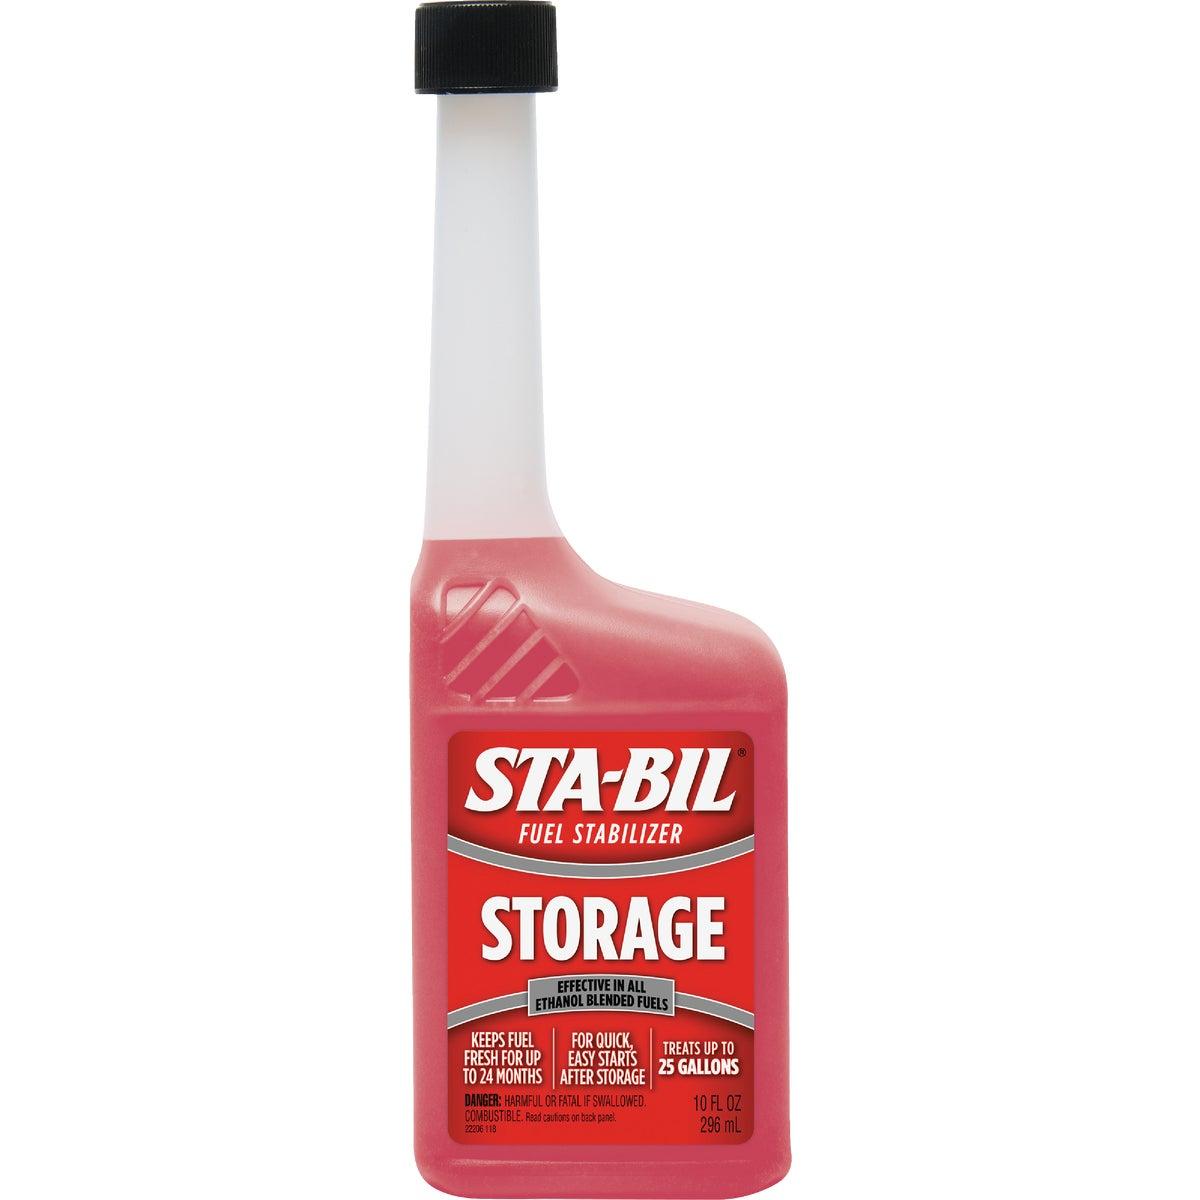 10Oz Fuel Stabil